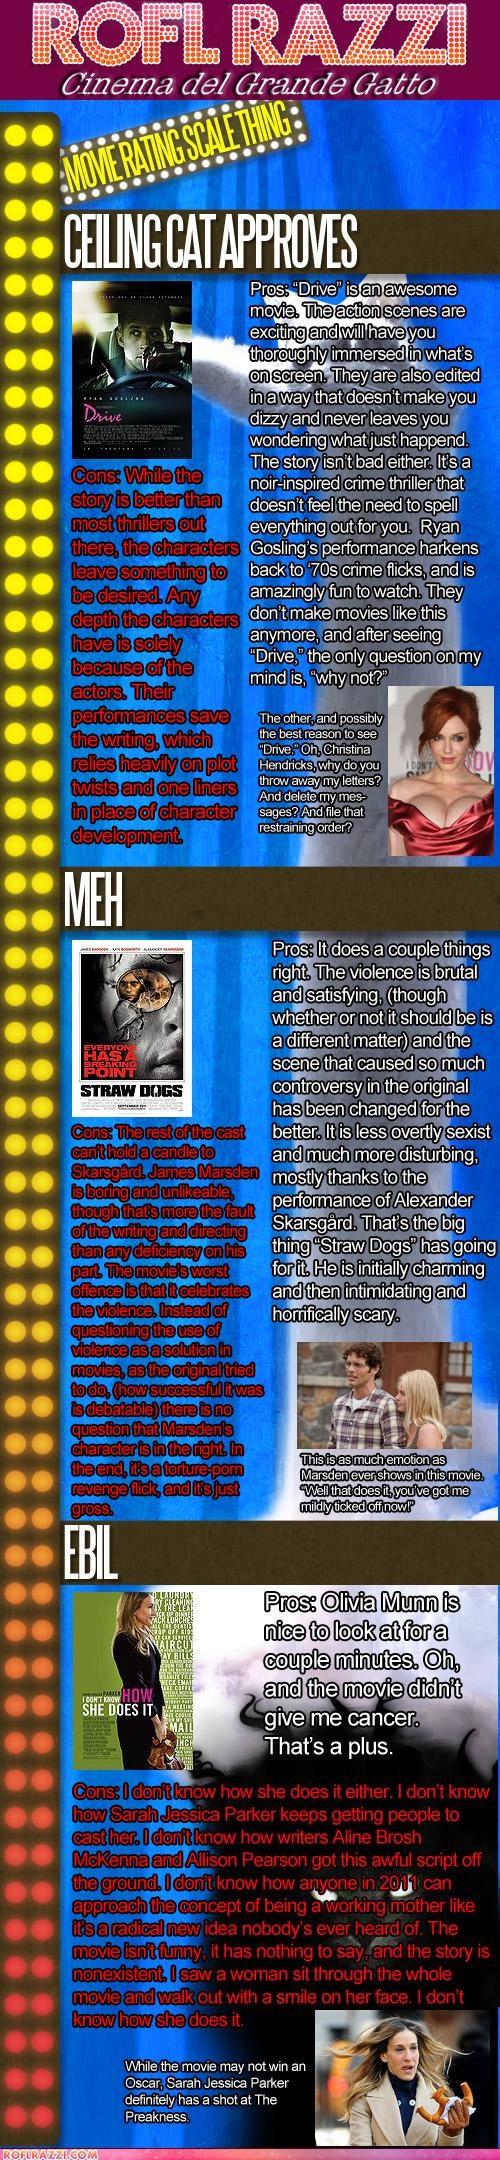 alexander skarsgard,Christina Hendricks,cinema,drive,i-dont-know-how-she-does-it,movies,reviews,Ryan Gosling,sarah jessica parker,straw dogs